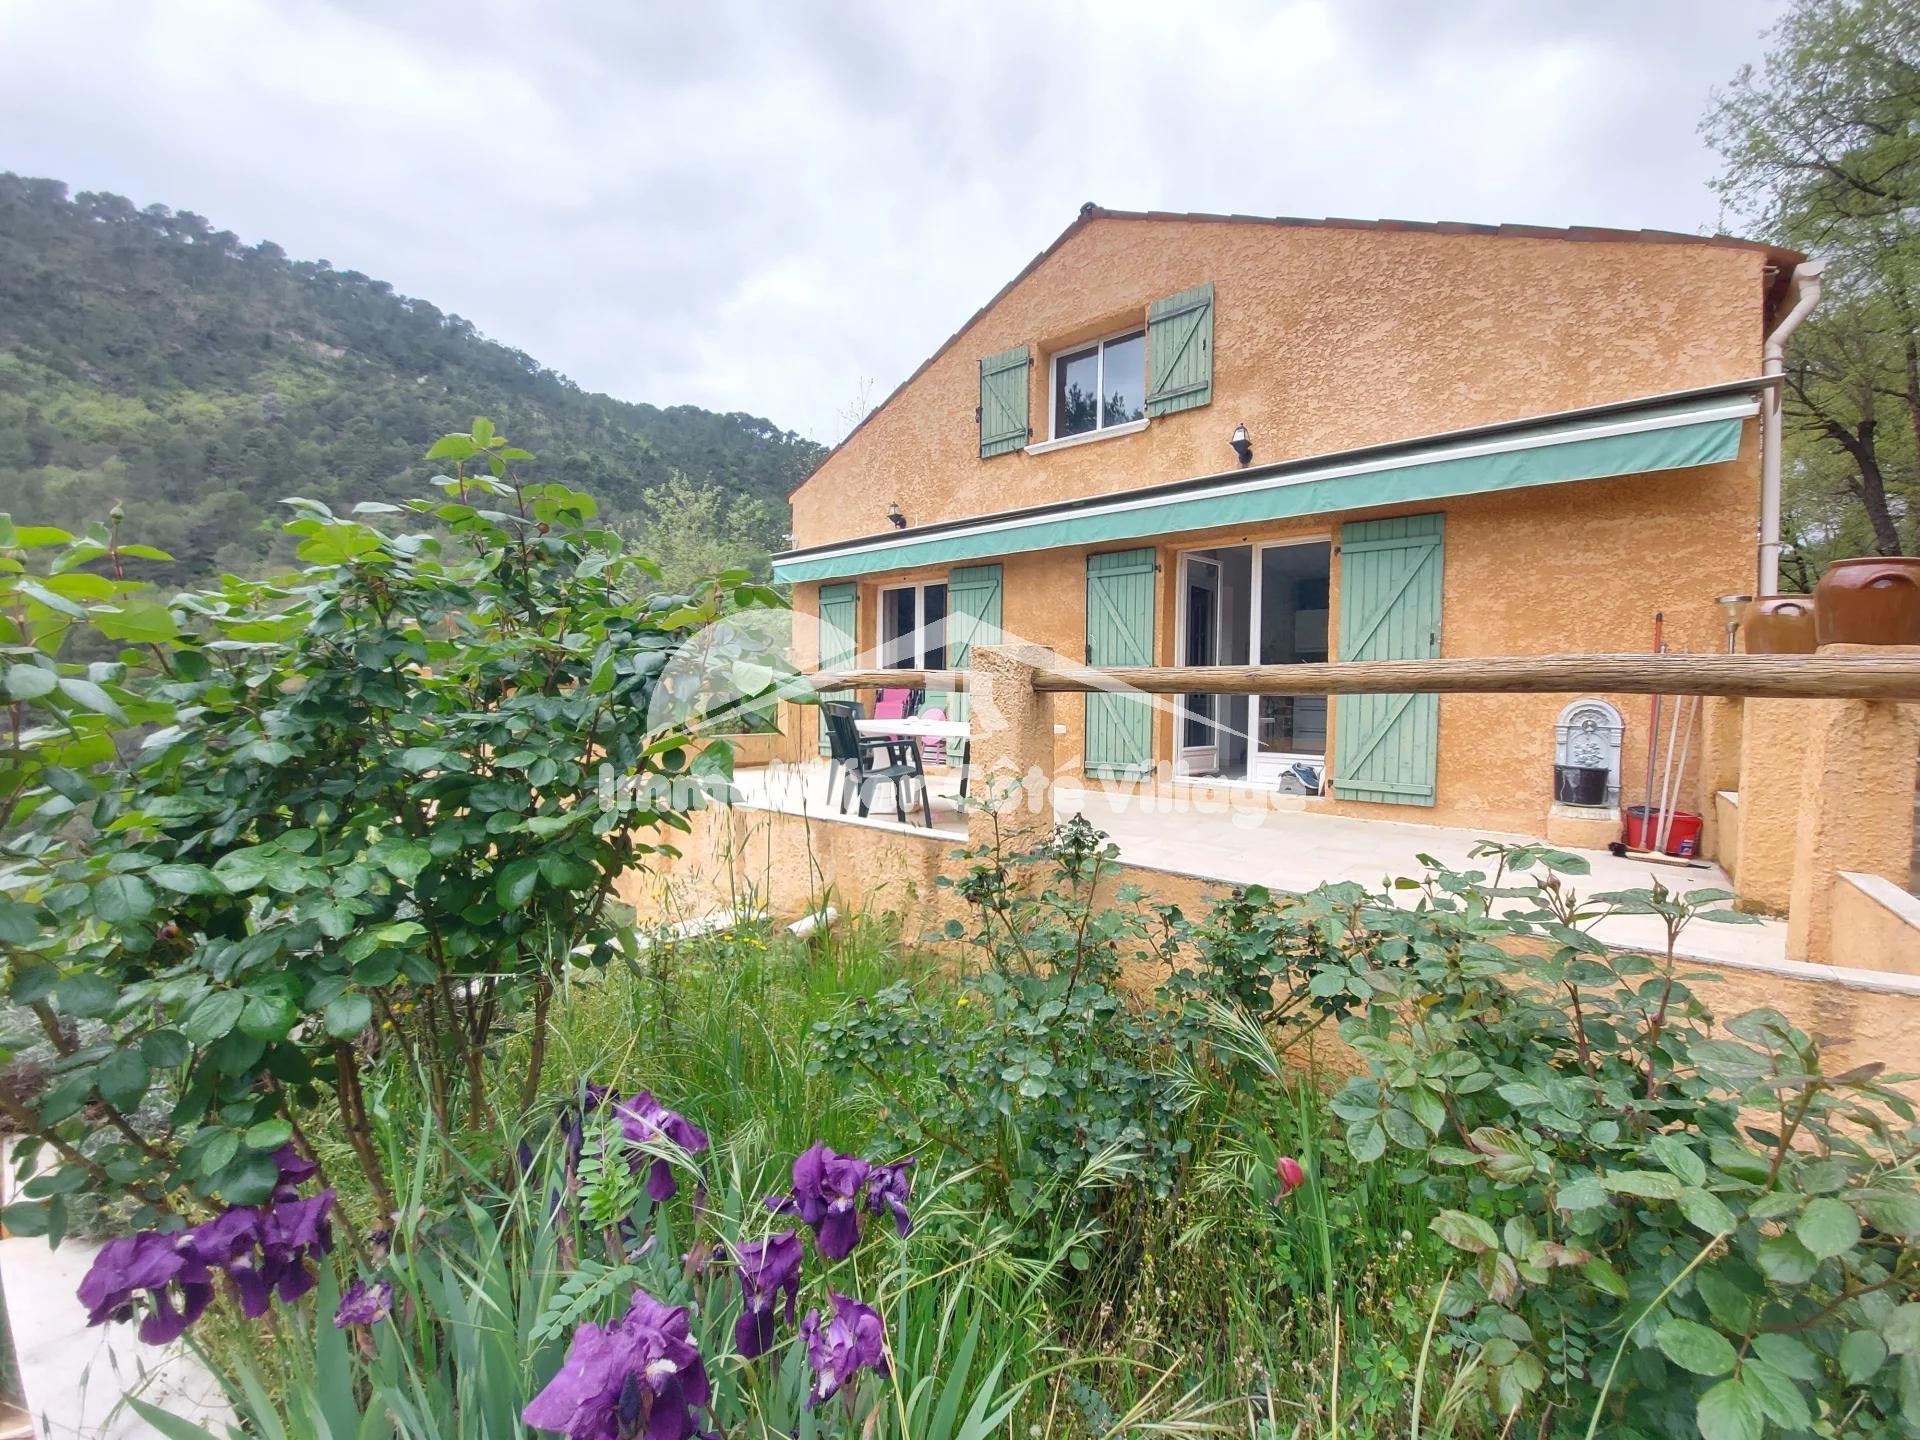 Villa 5 pieces + studio sur 3300m2 de terrain